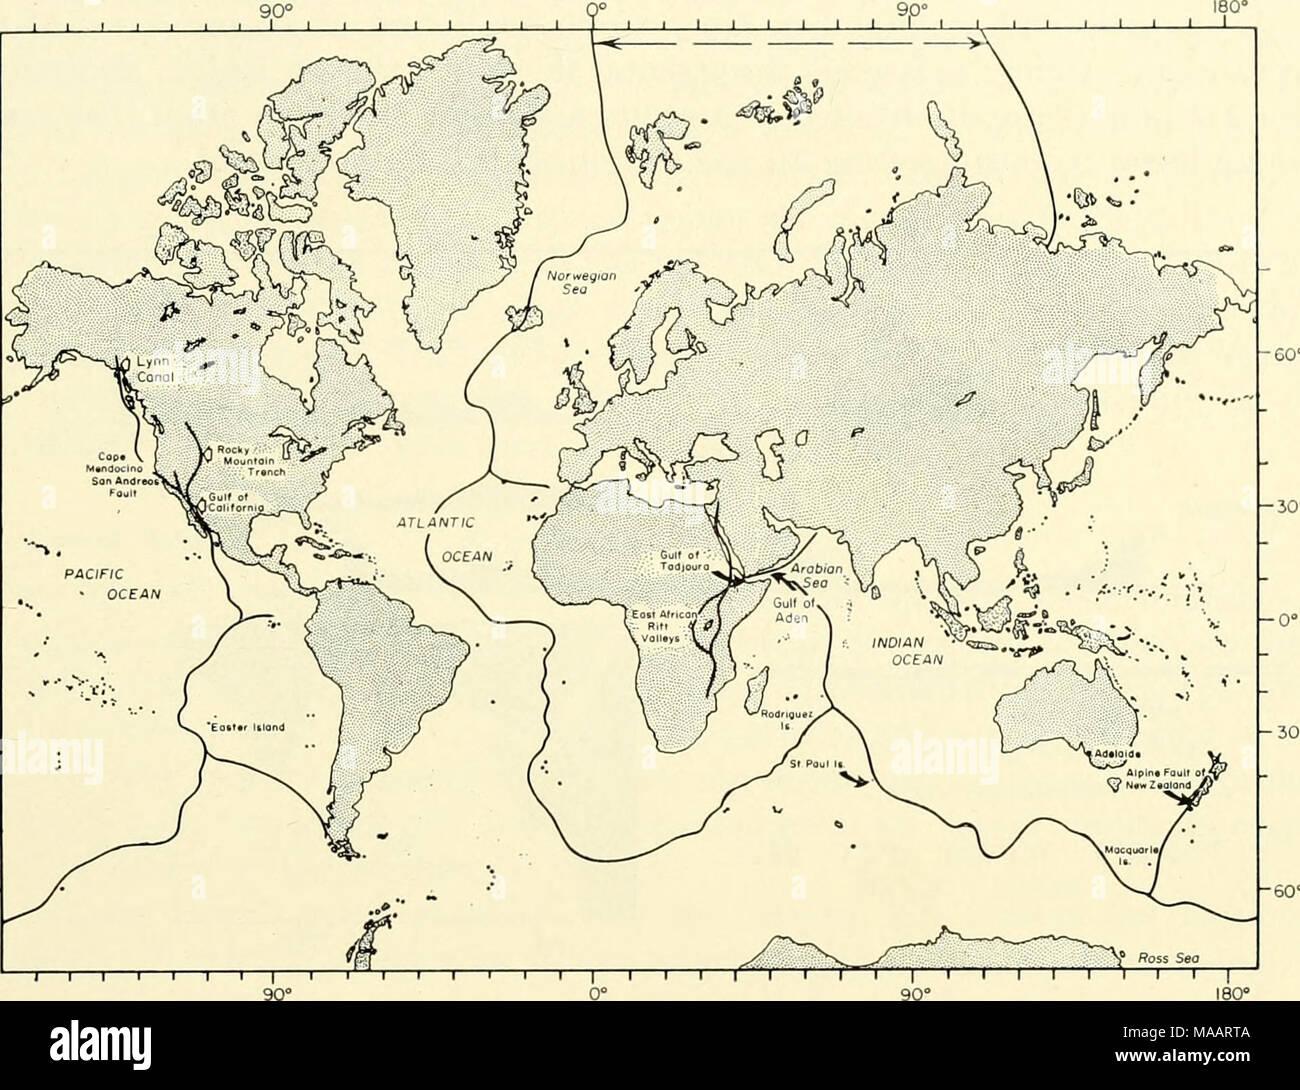 The Earth beneath the sea : History . 60^ 30°- 60° Fig. 5. World on